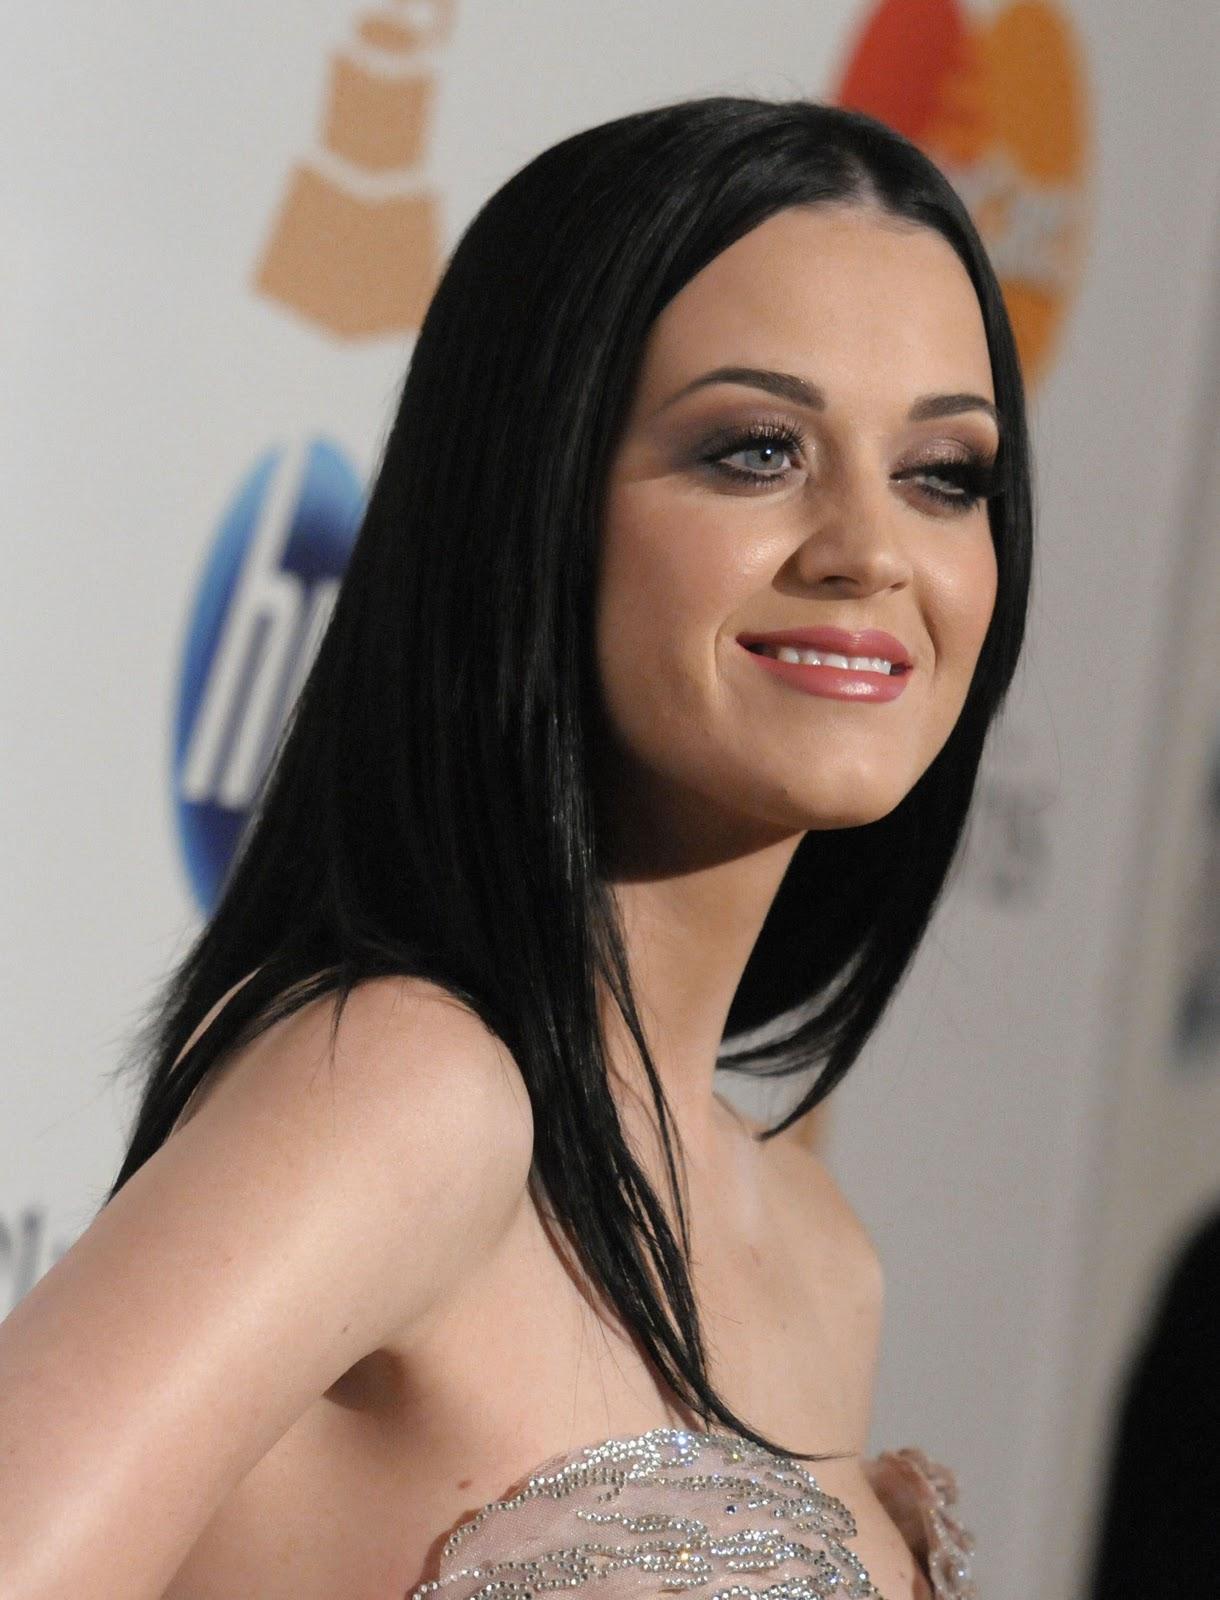 http://4.bp.blogspot.com/-FWLyxL1Rtjk/TlUfpjPruEI/AAAAAAAAAAc/tL7hQTBa-Pc/s1600/katy_perry_hair_color.jpg